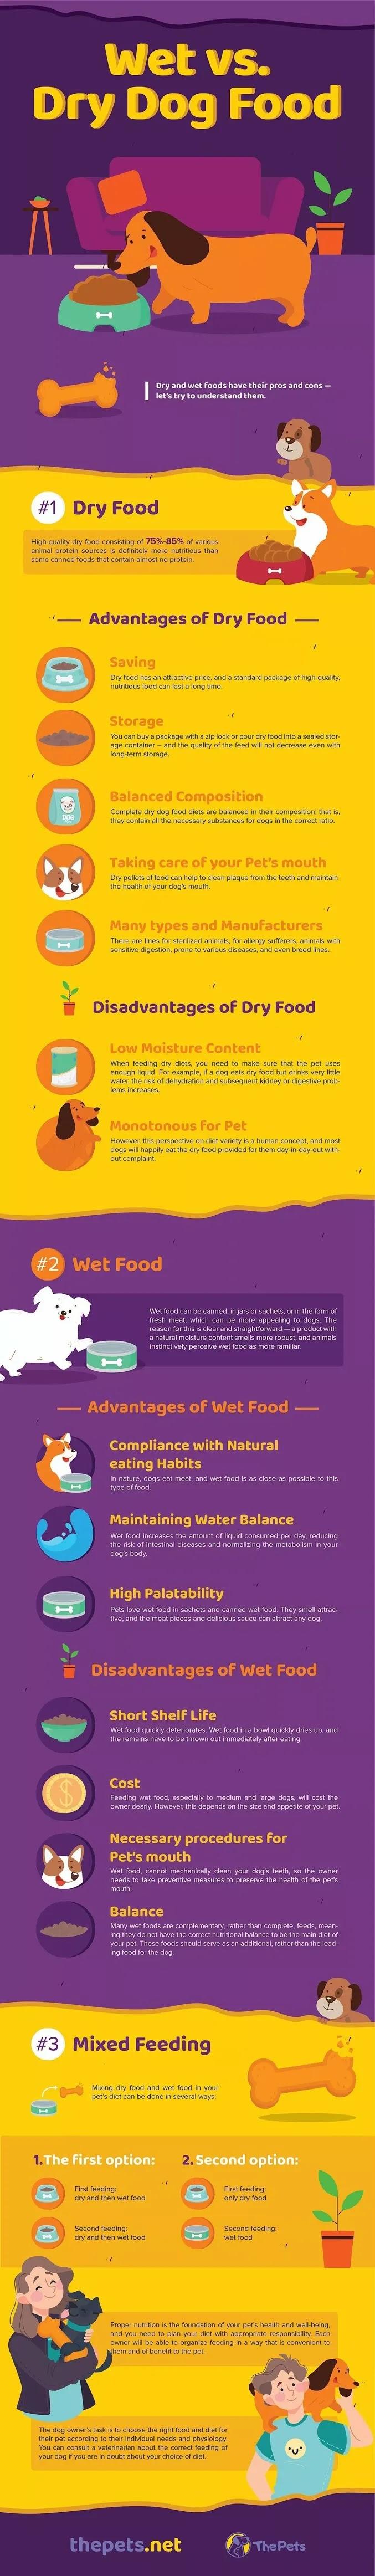 Wet vs. Dry Dog Food #infographic